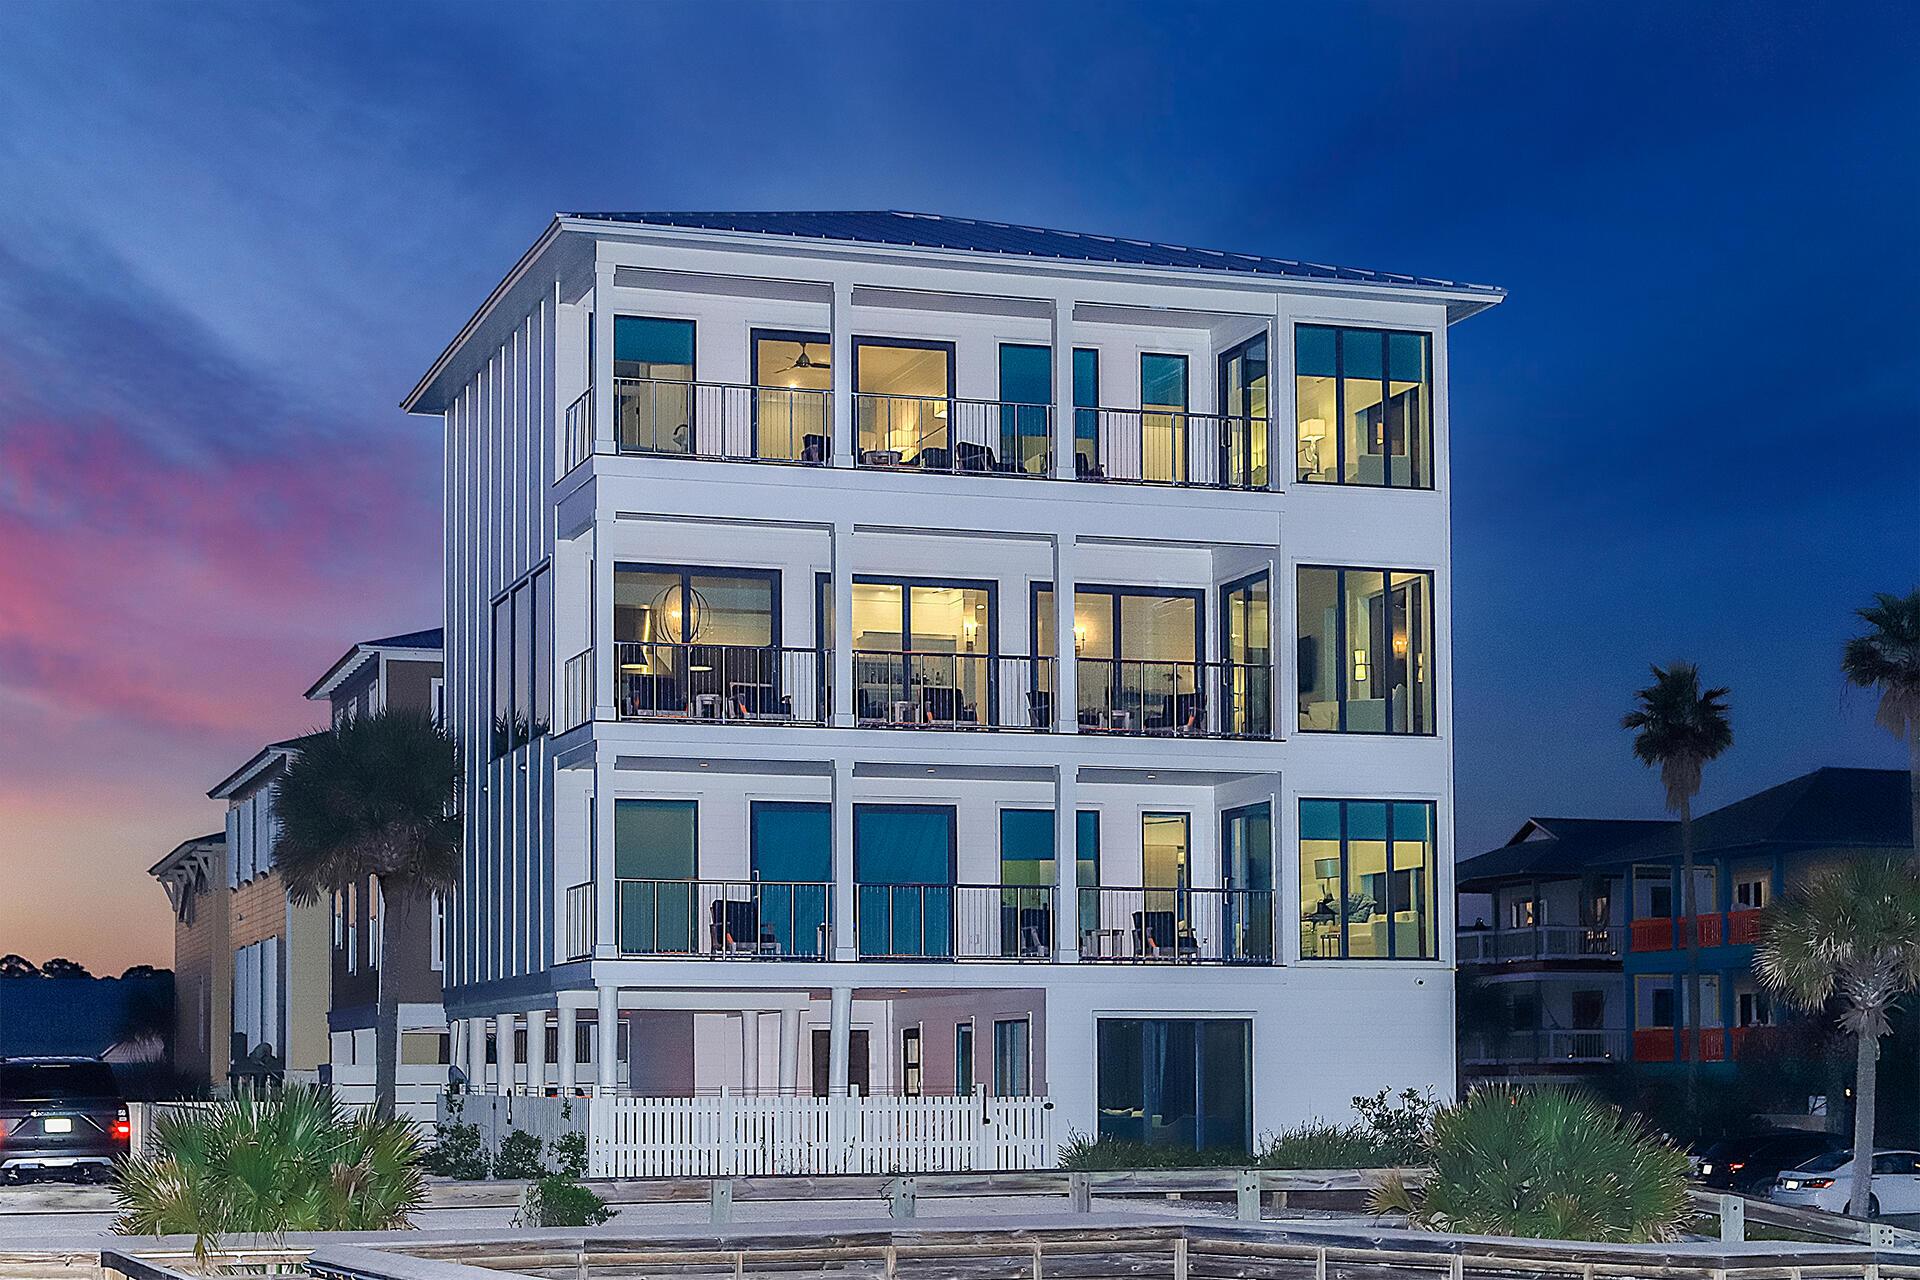 A 6 Bedroom 7 Bedroom Grayton Beach Home